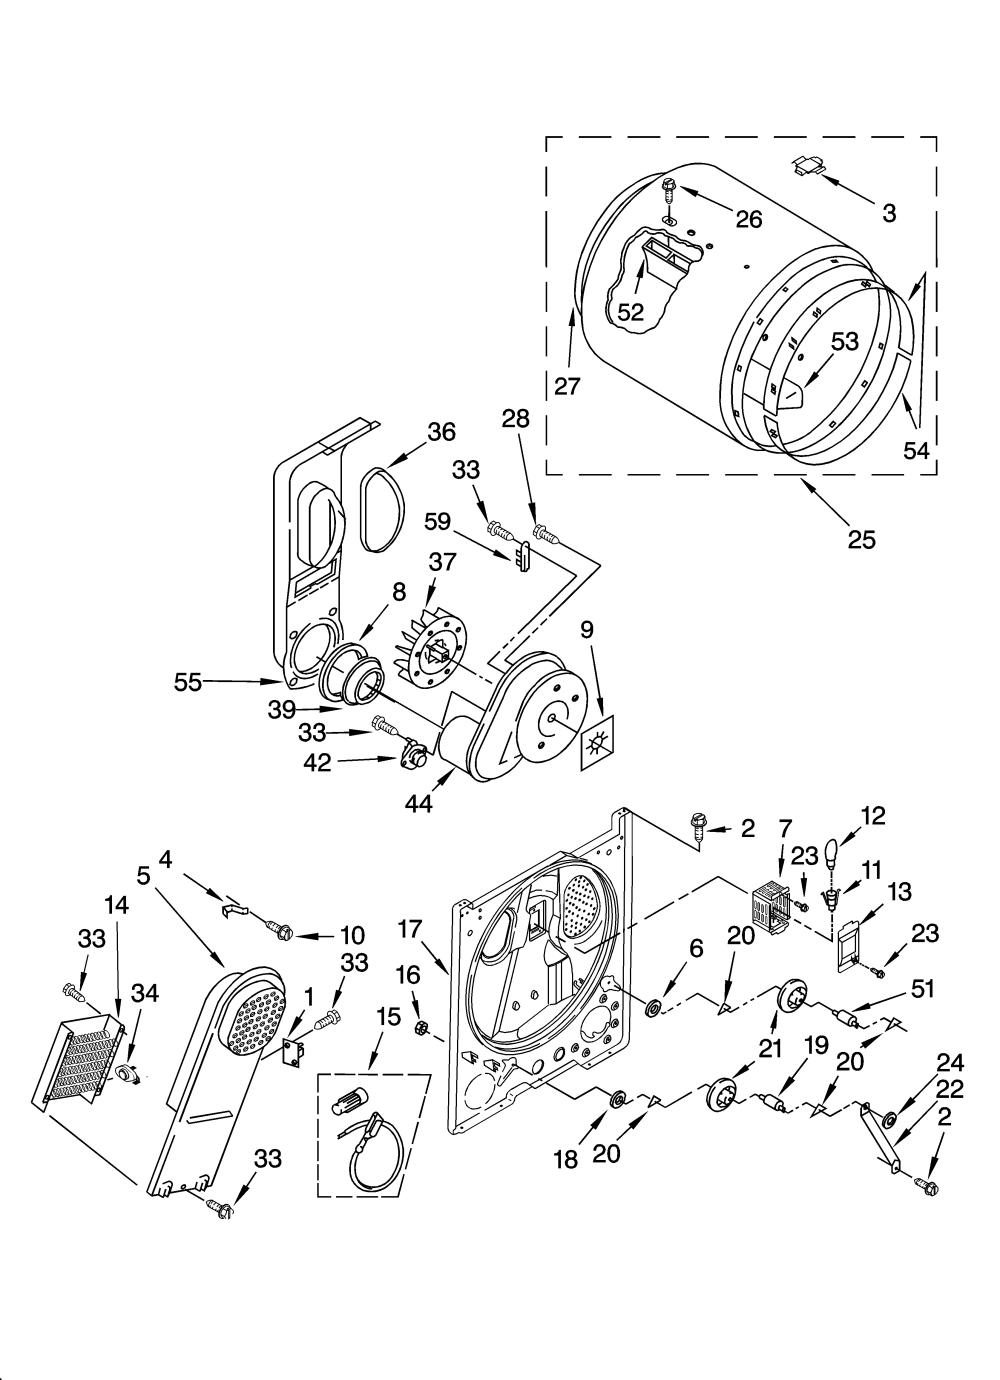 medium resolution of 10 3 wire for dryer diagram